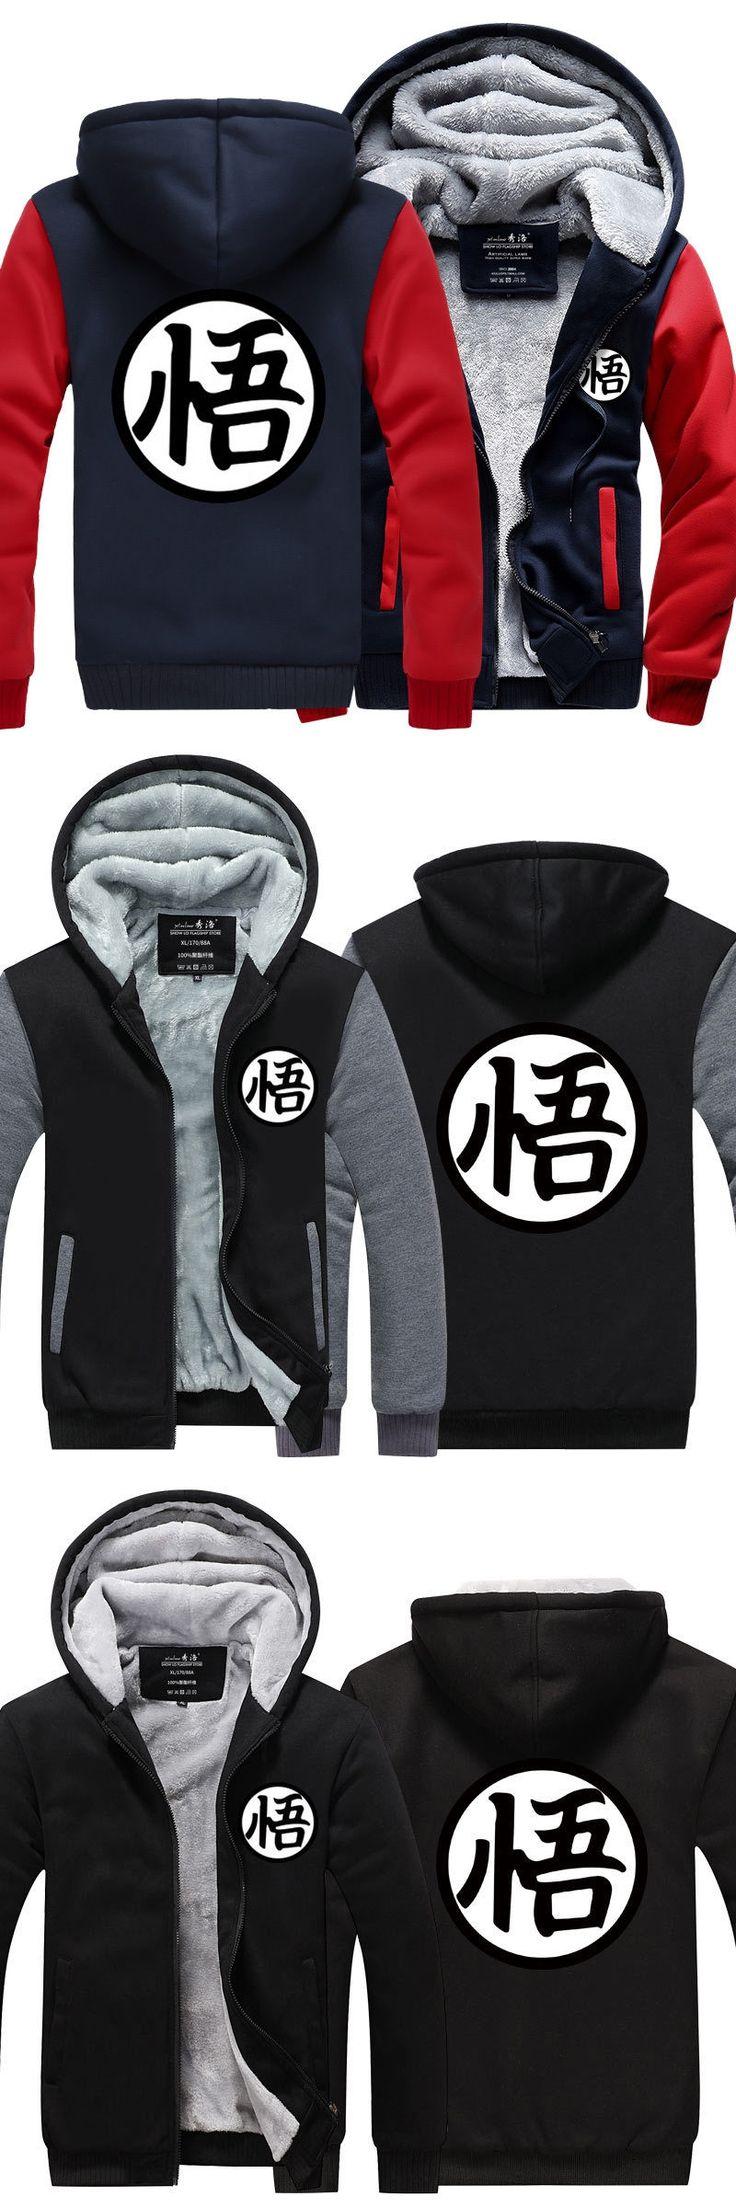 Dragonball Son Goku Dragon Ball Super Hoodie Sweatshirt Costume Jacket  For Men Winter Spring Wear